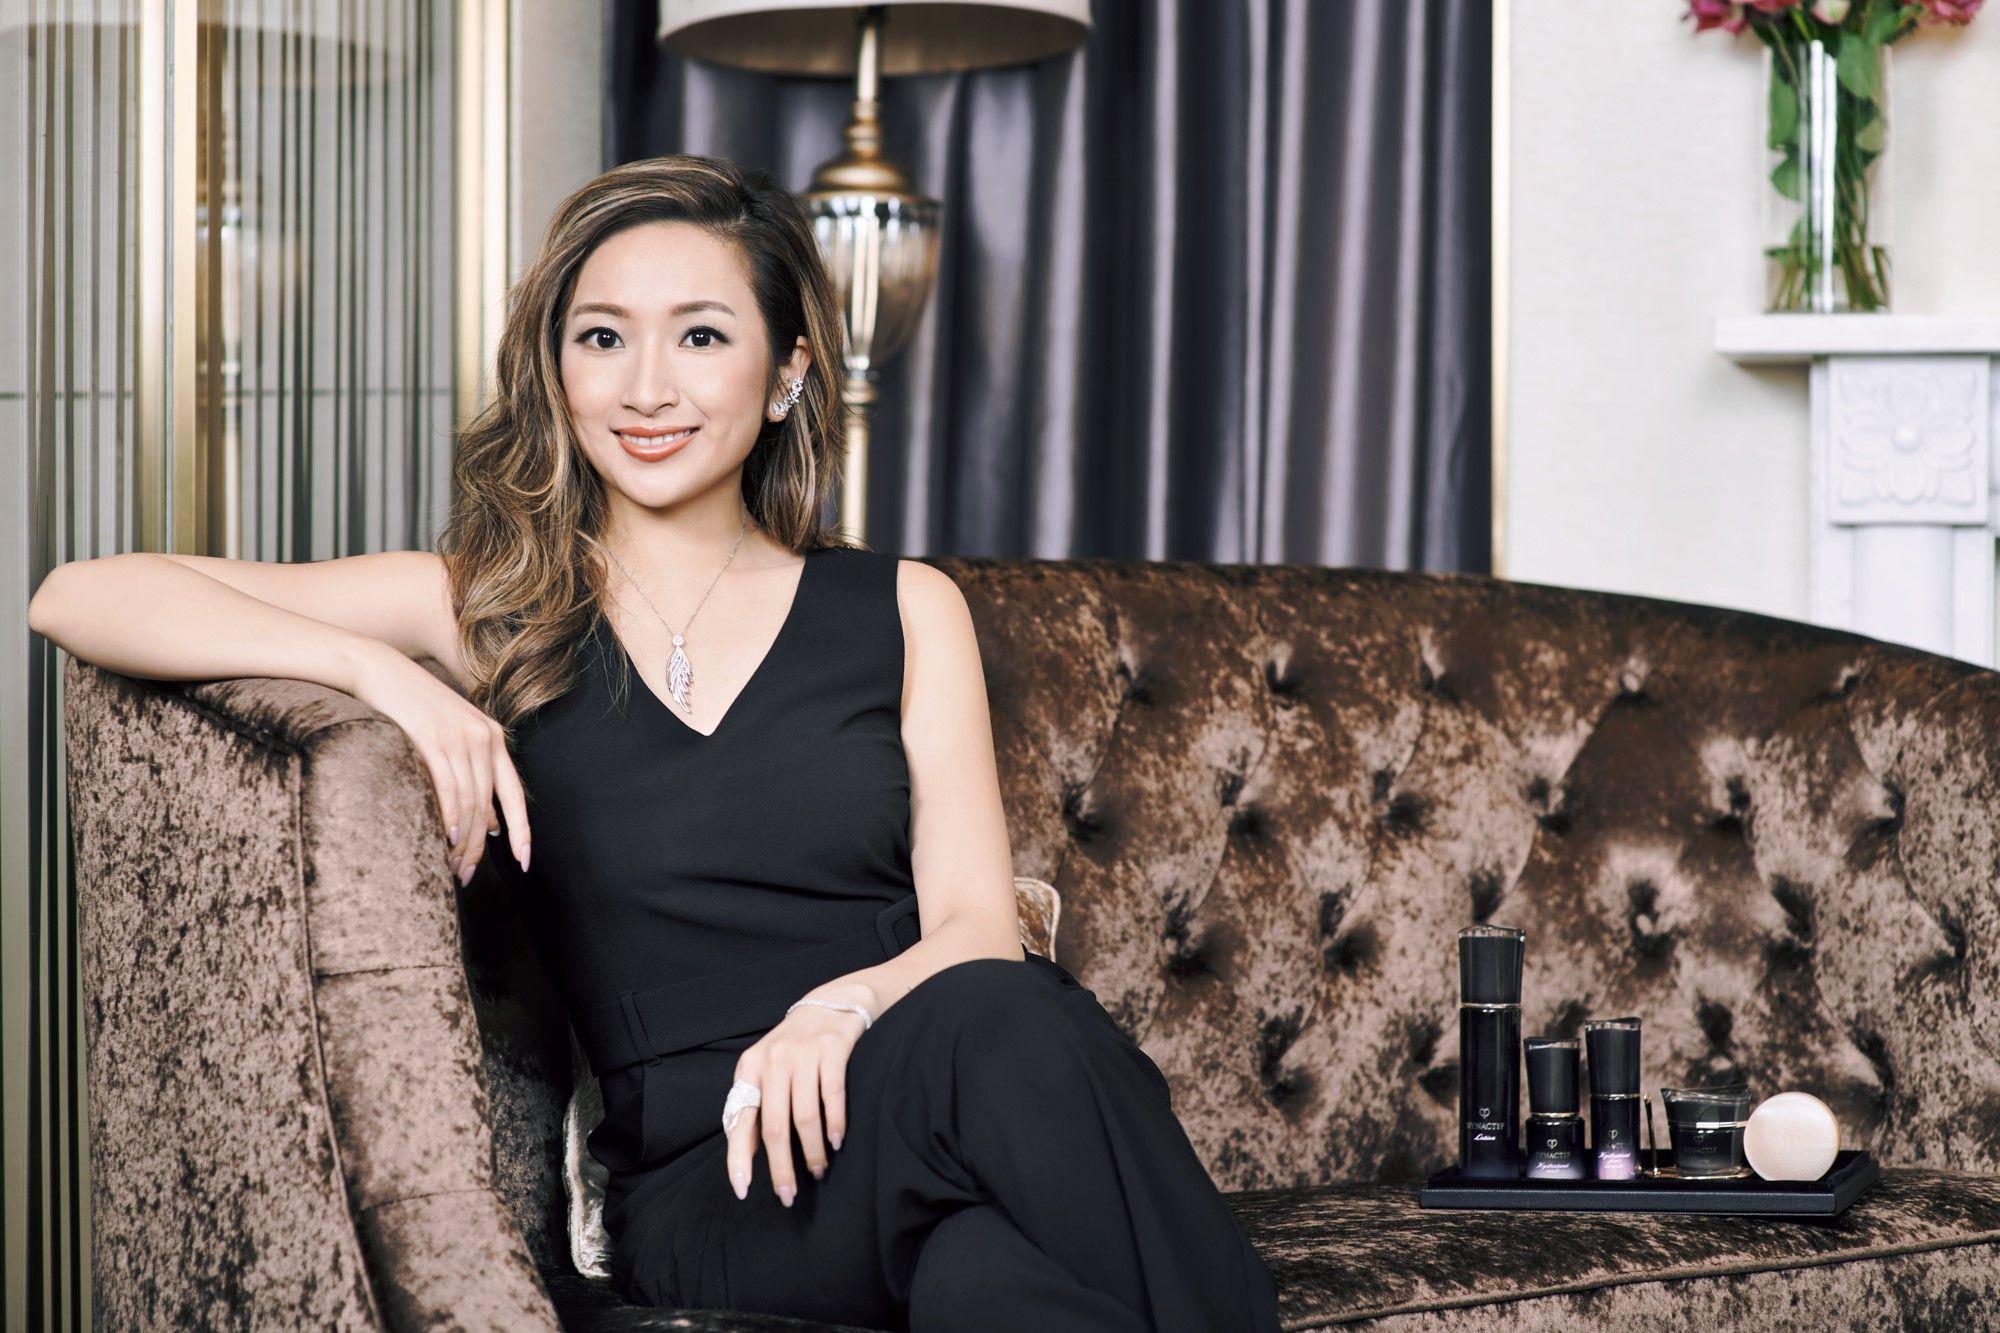 A New Light: Sarah Zhuang